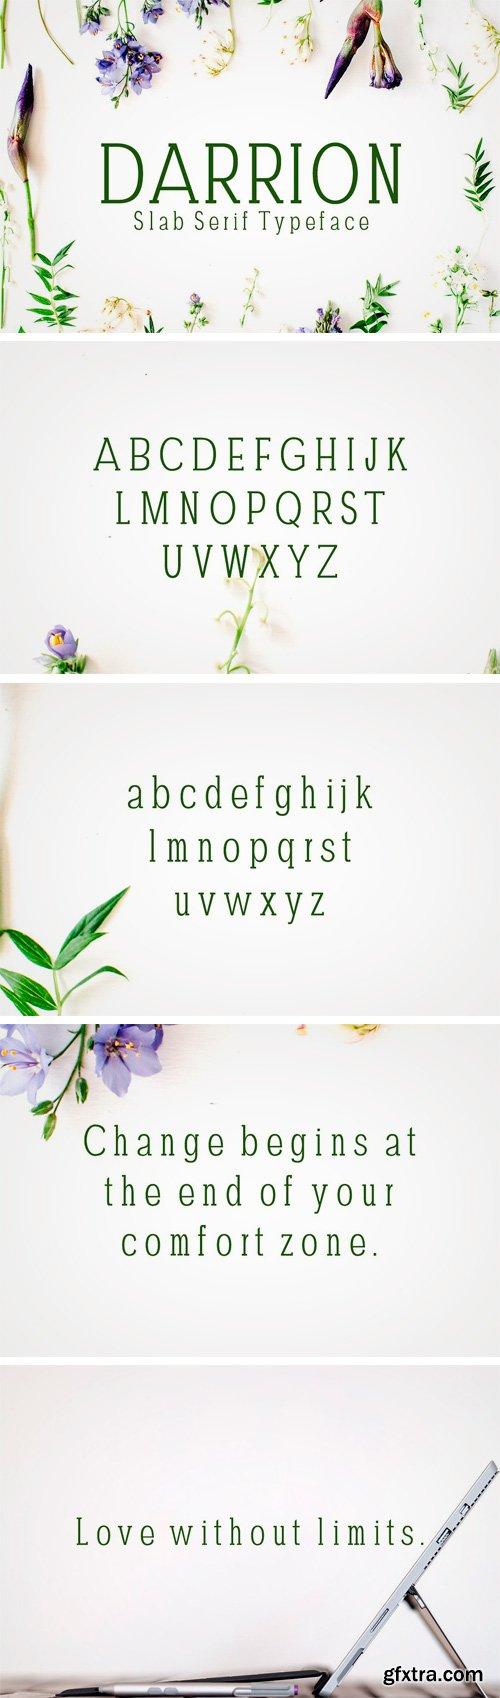 CM - Darrion Slab Serif Typeface 1696238